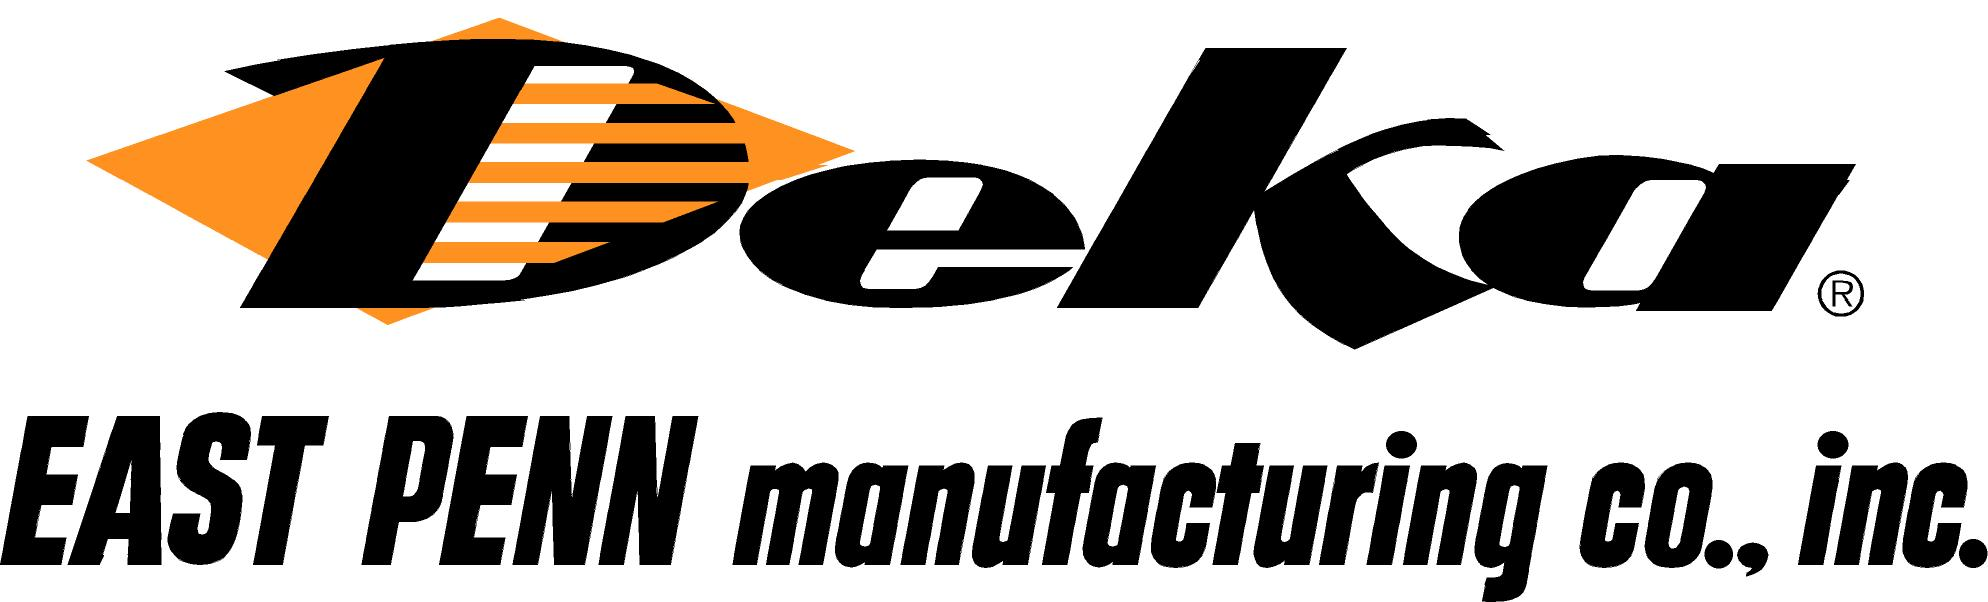 https://0201.nccdn.net/1_2/000/000/177/365/Deka-Logo.jpg